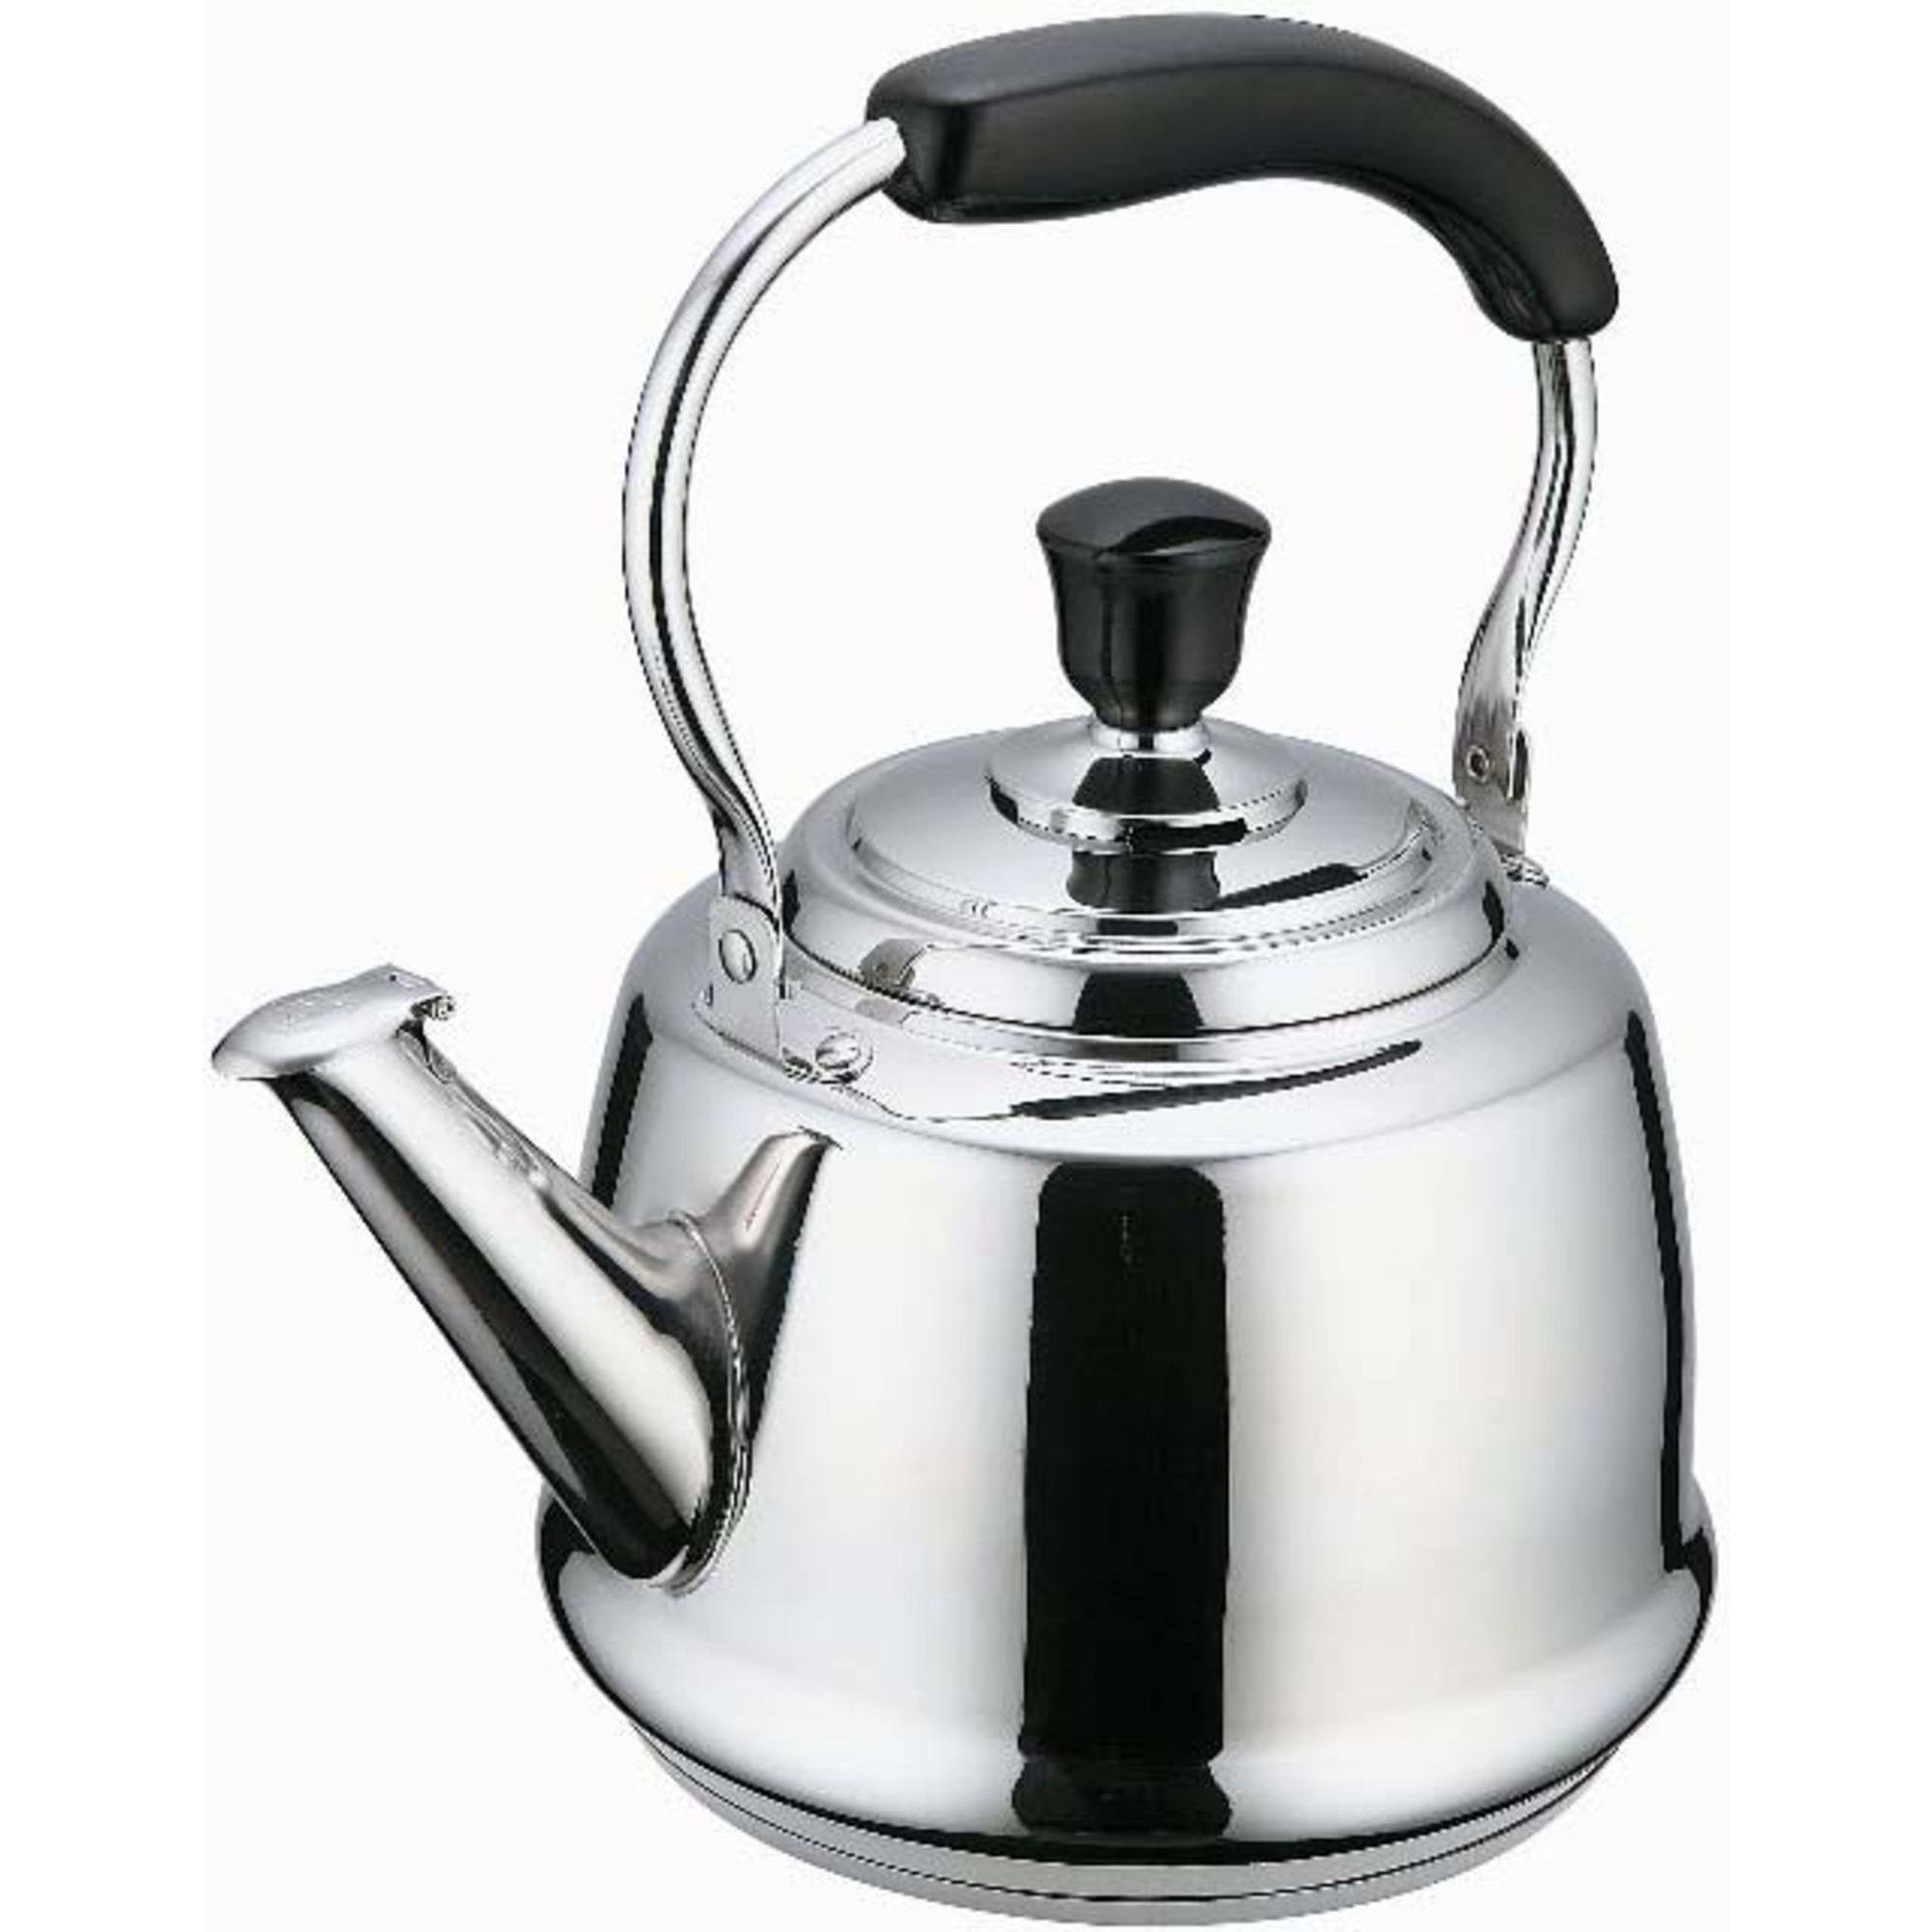 Dorre Kaffepanna 15 Liter Rostfri